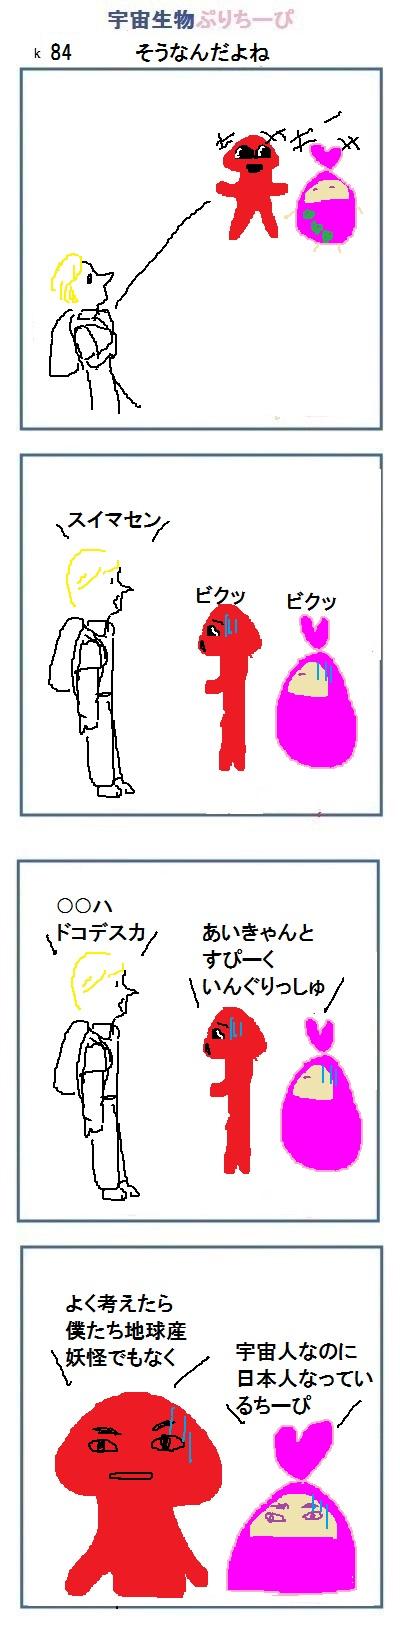 160828_k84.jpg